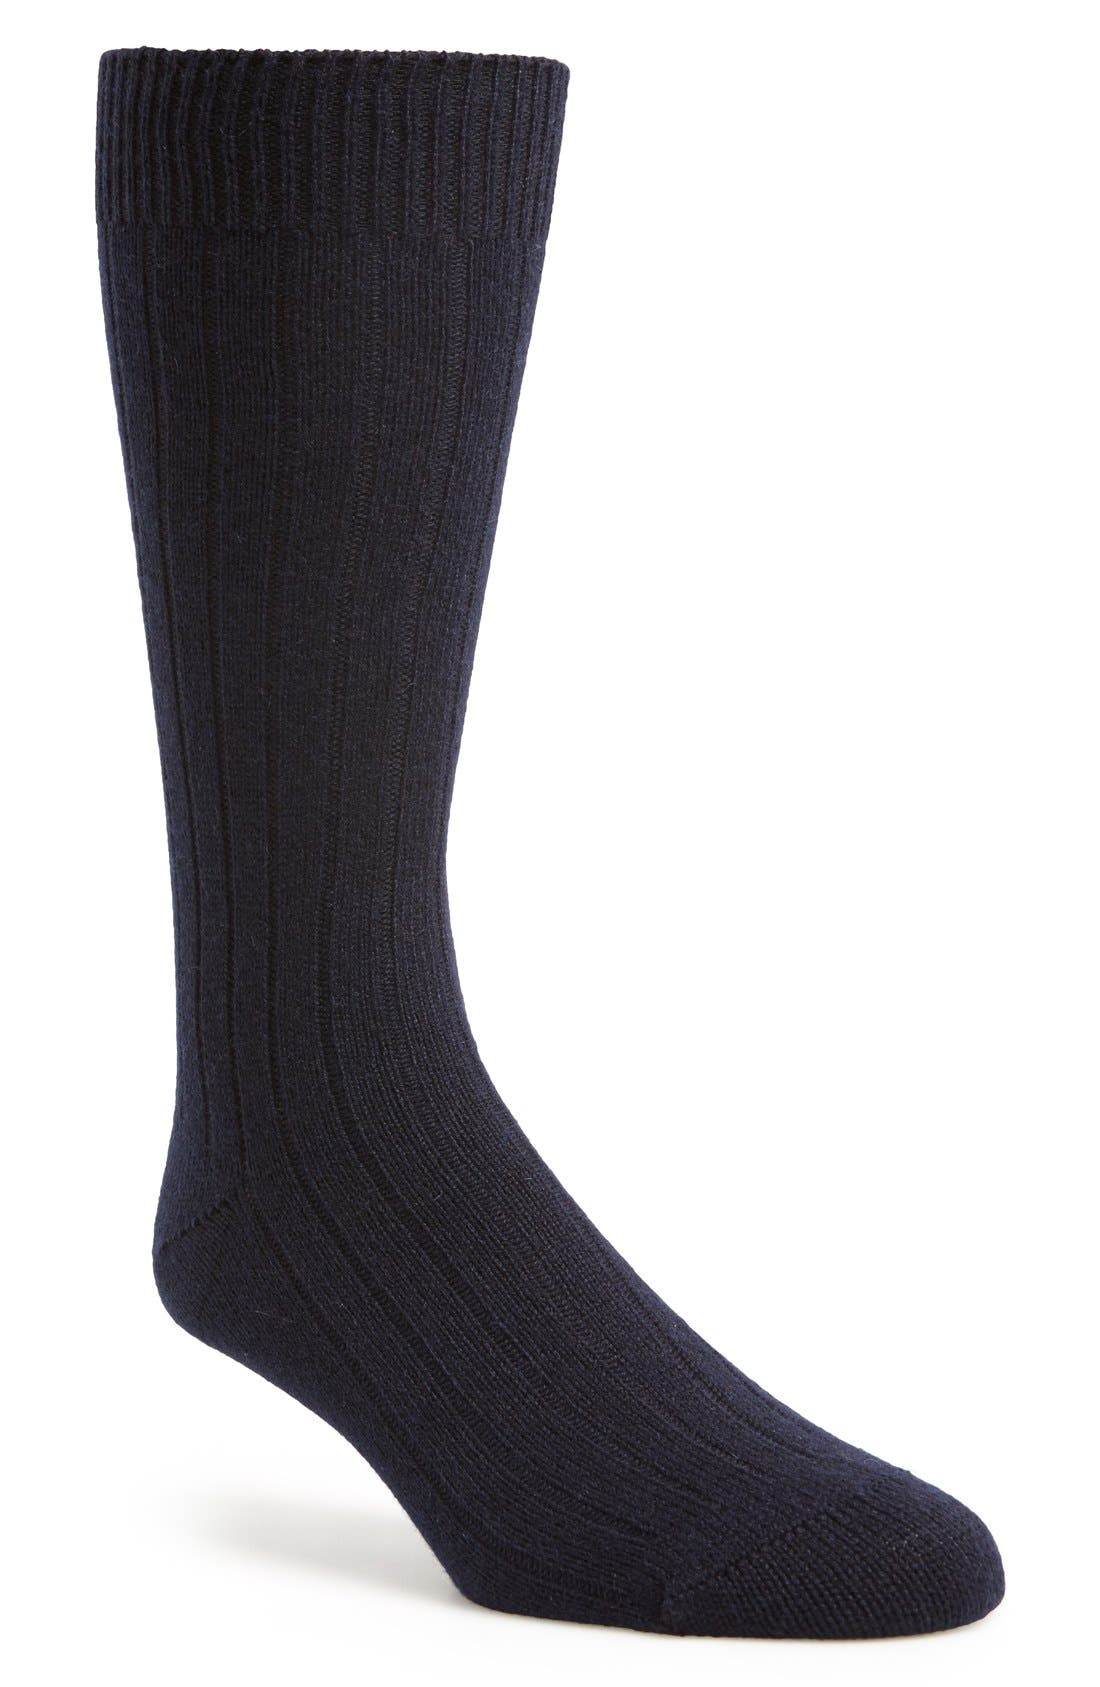 'Waddington' Cashmere Blend Mid Calf Socks,                             Main thumbnail 9, color,